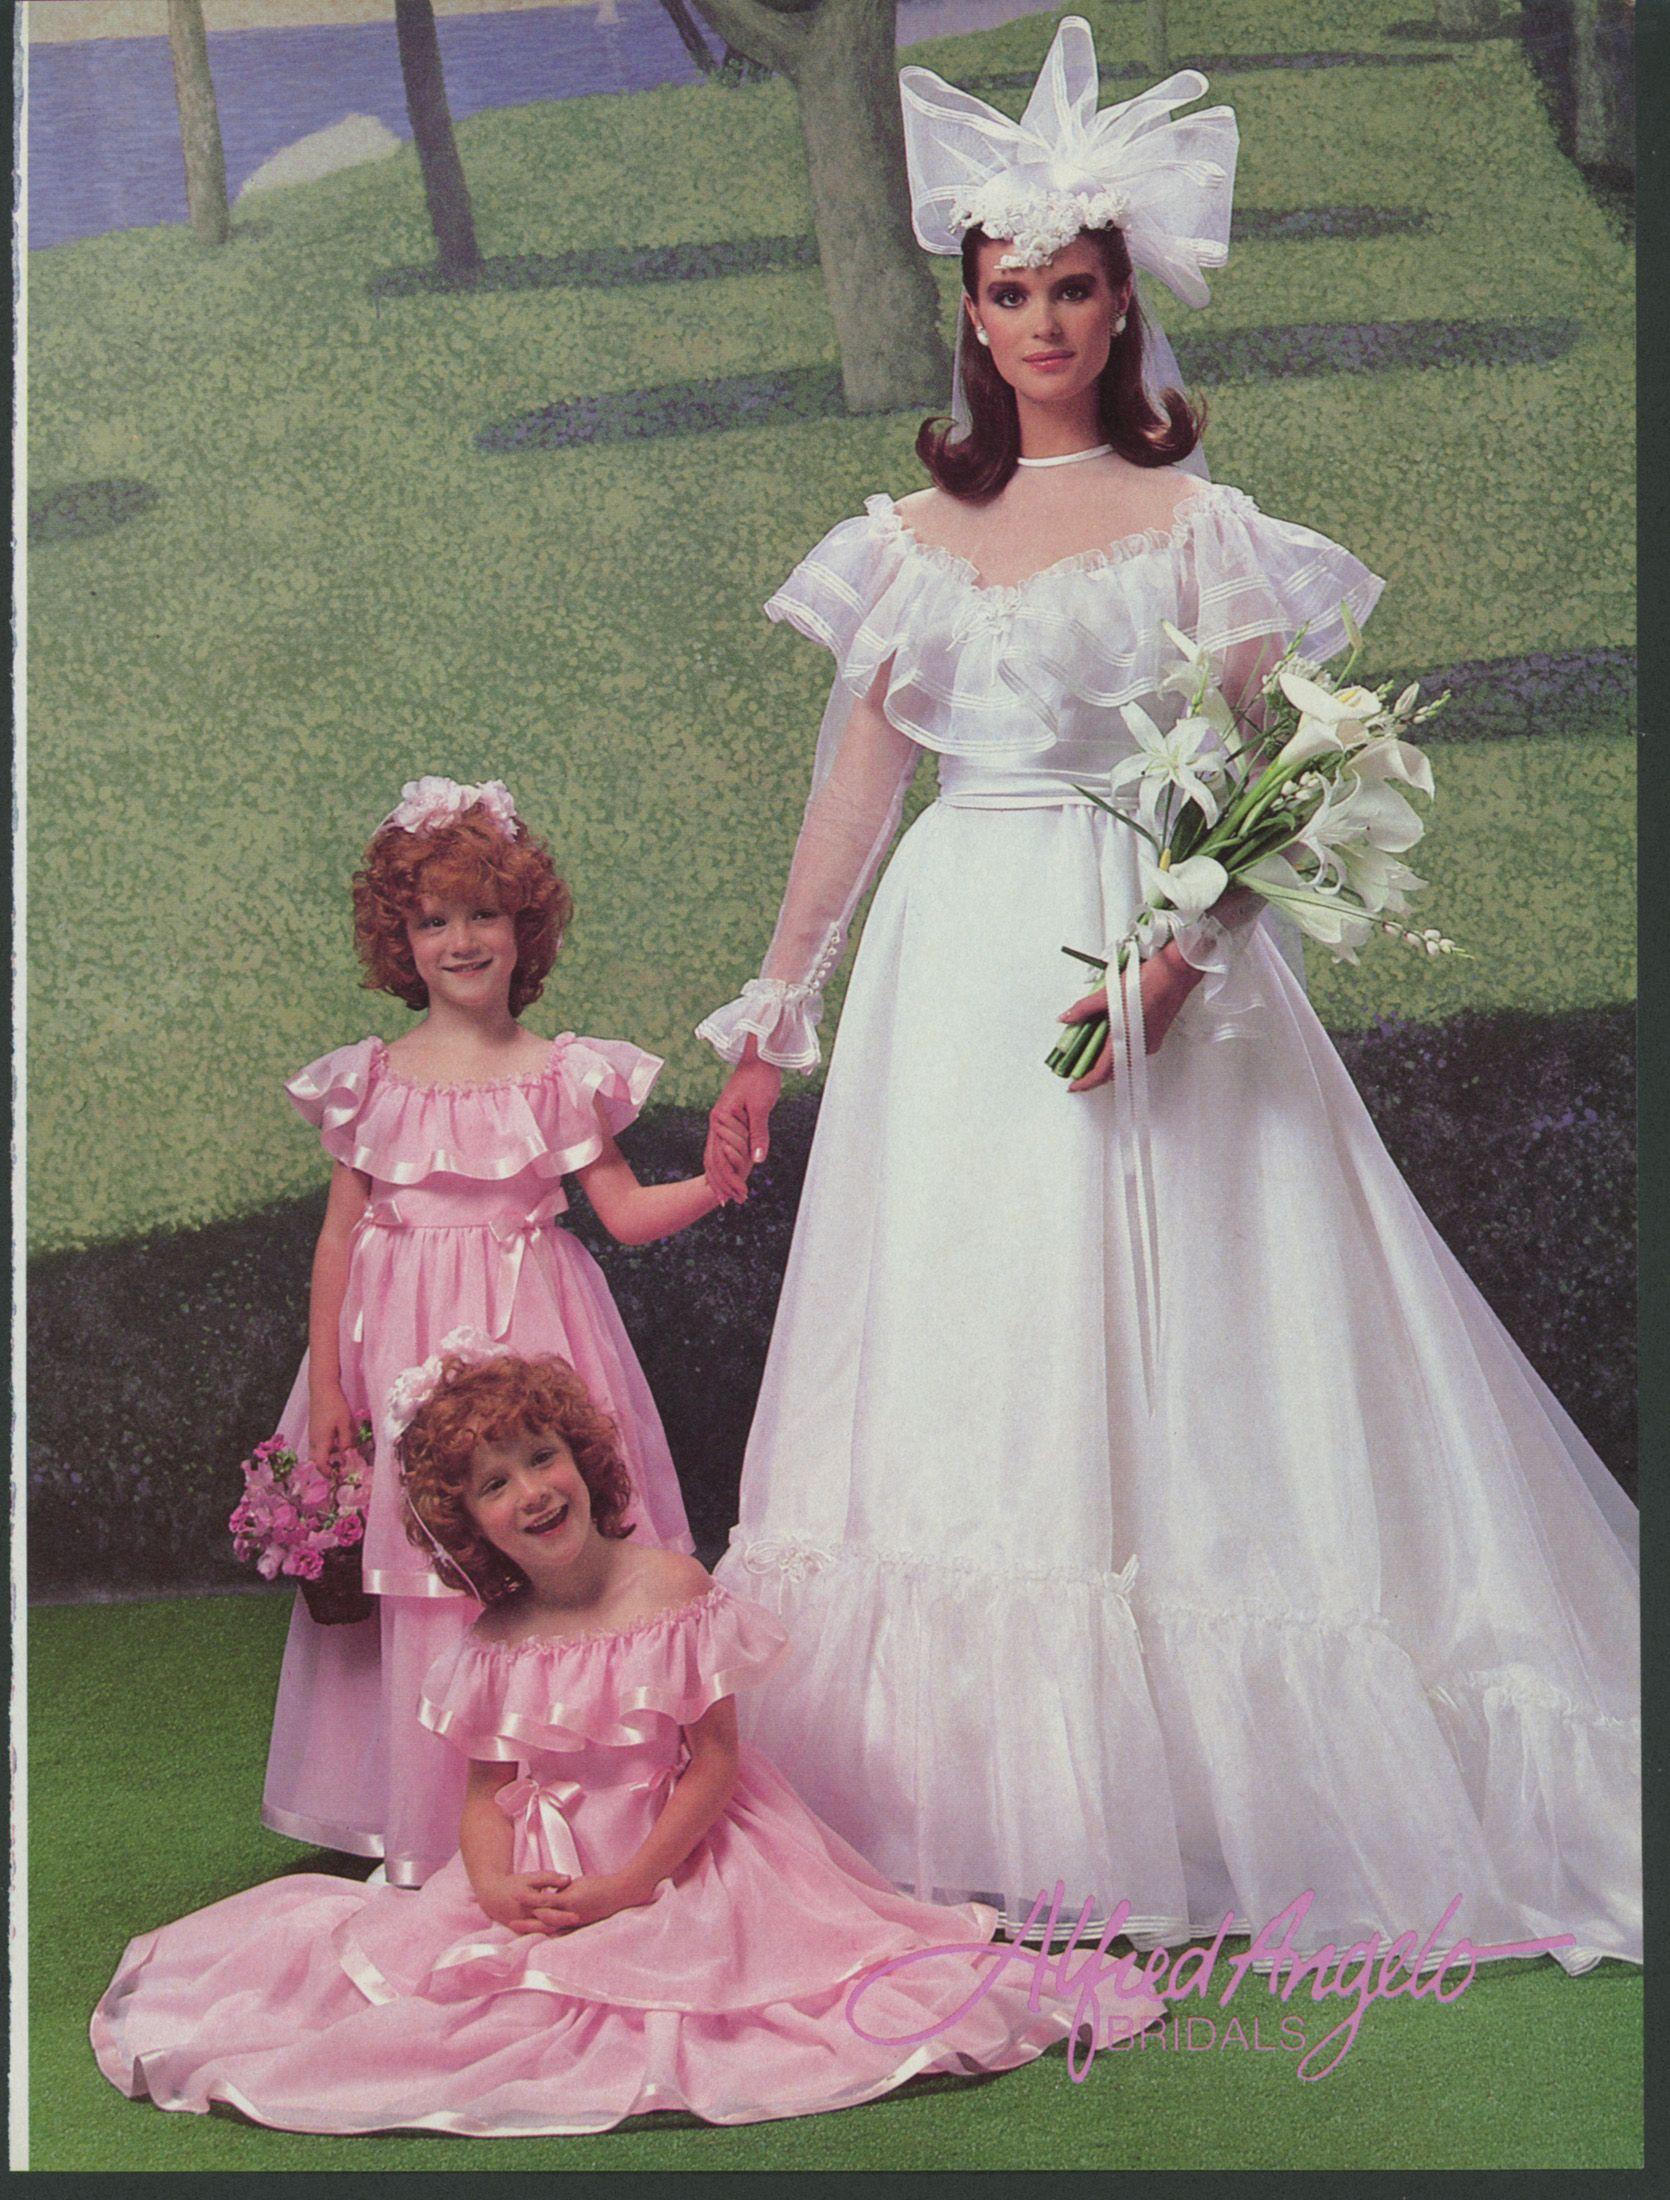 Pin On Vintage Weddings [ 2200 x 1670 Pixel ]